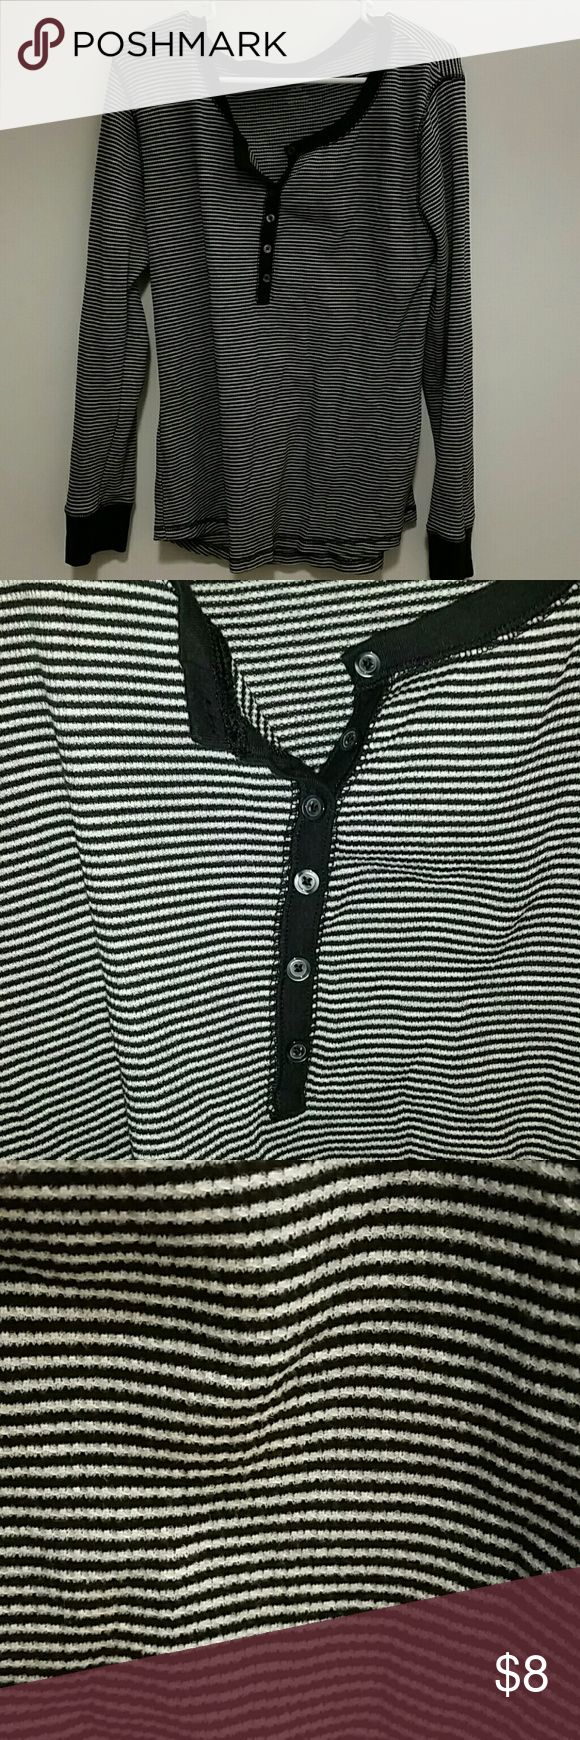 Black t shirt old navy - Black And White Waffle Shirt Old Navy Black And White Waffle Long Sleeve T Shirt